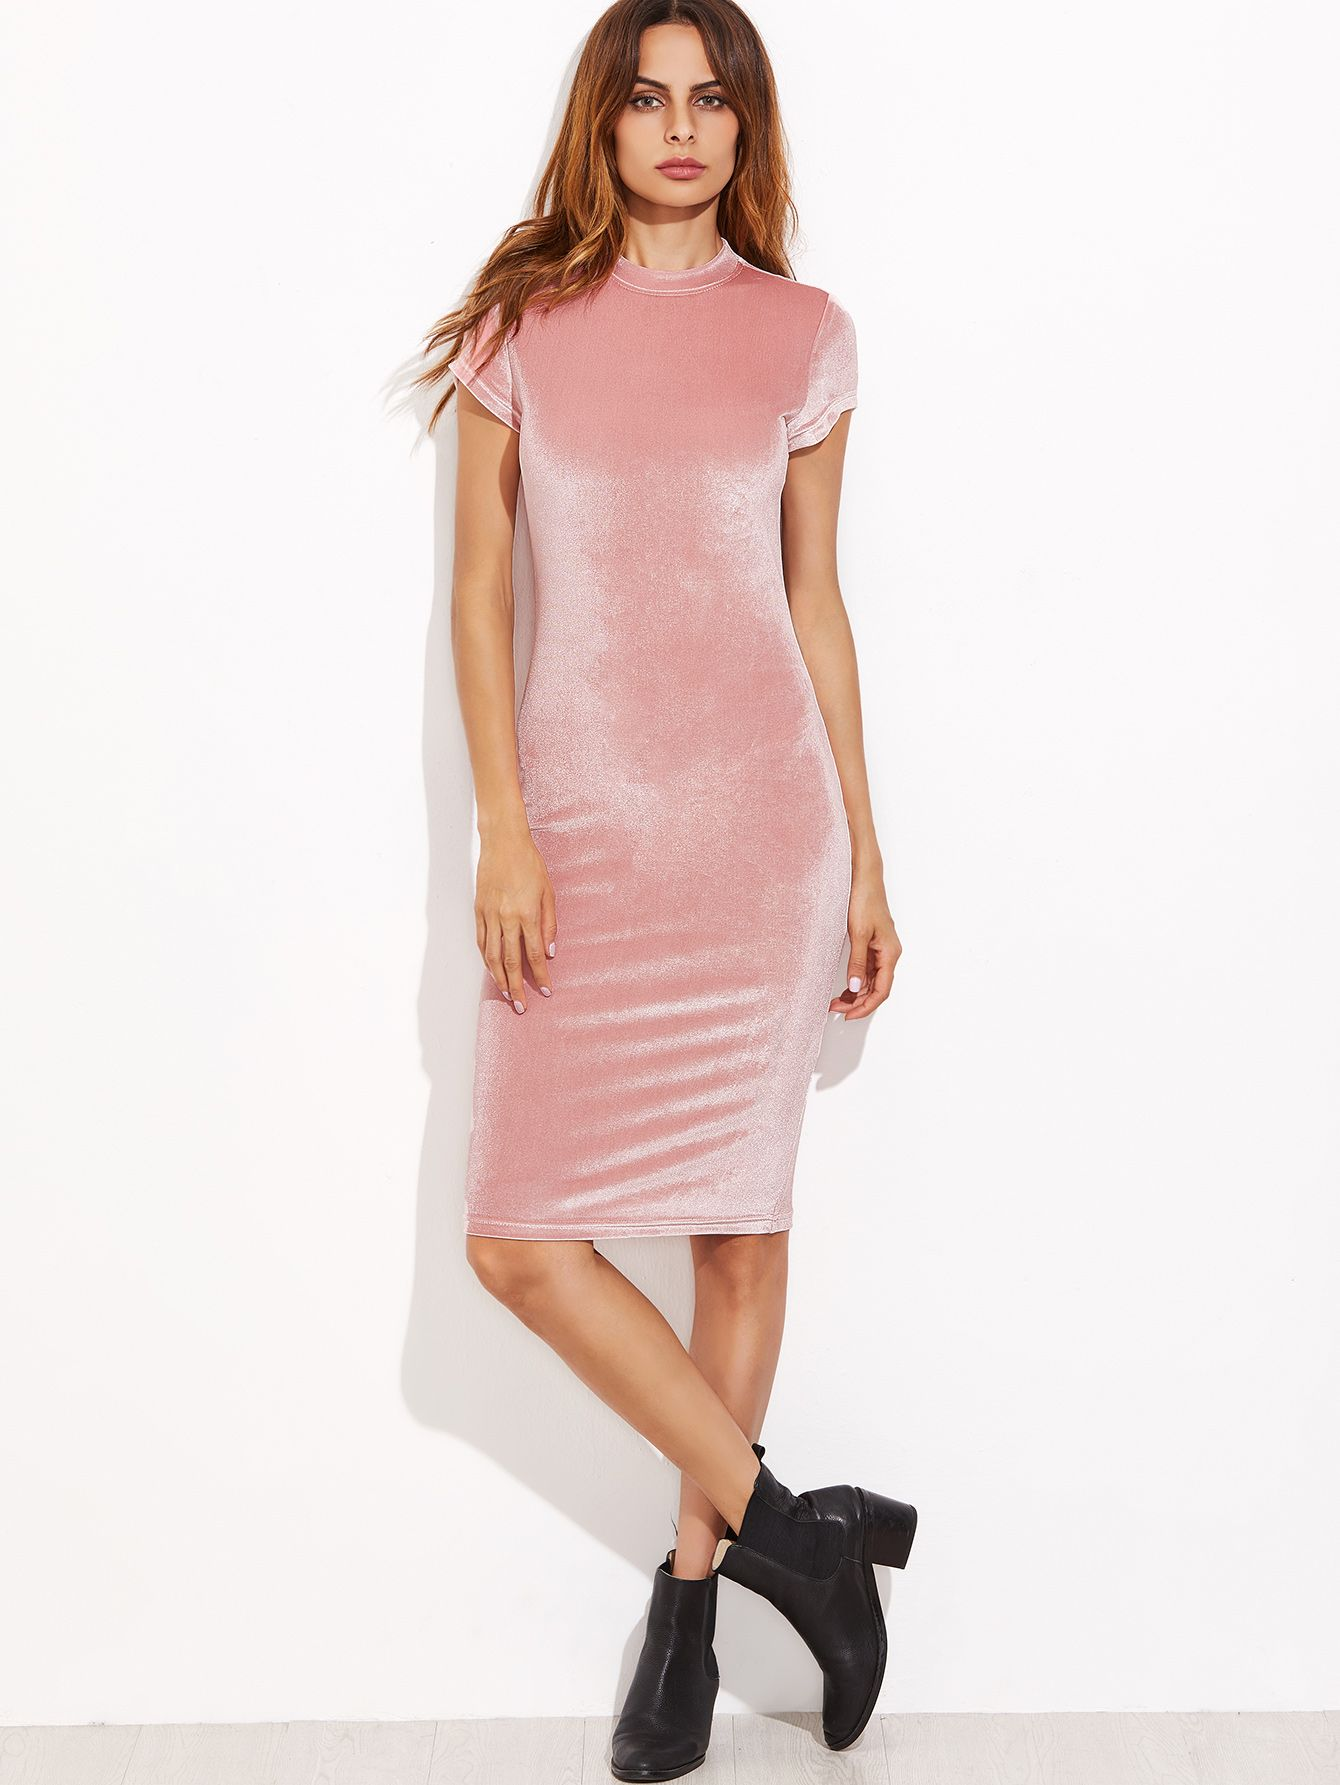 Vestido de tubo de terciopelo con cuello alto - rosa | Pinterest ...